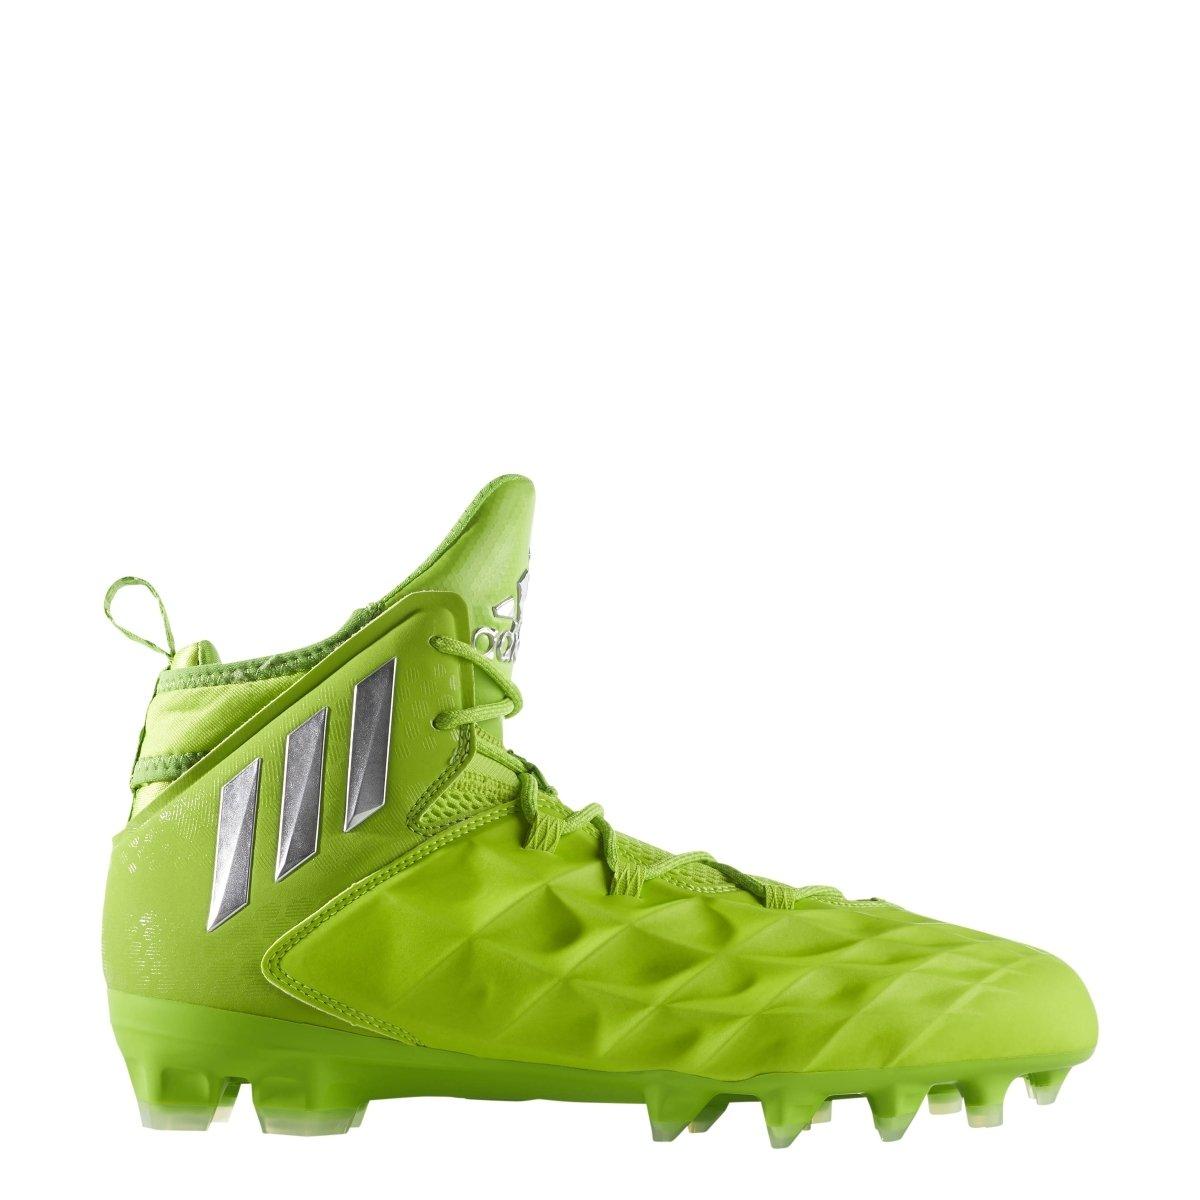 adidas Freak Lax Mid Shoe Men's Lacrosse 7.5 Solar Slime-Silver-Semi Solar Green by adidas